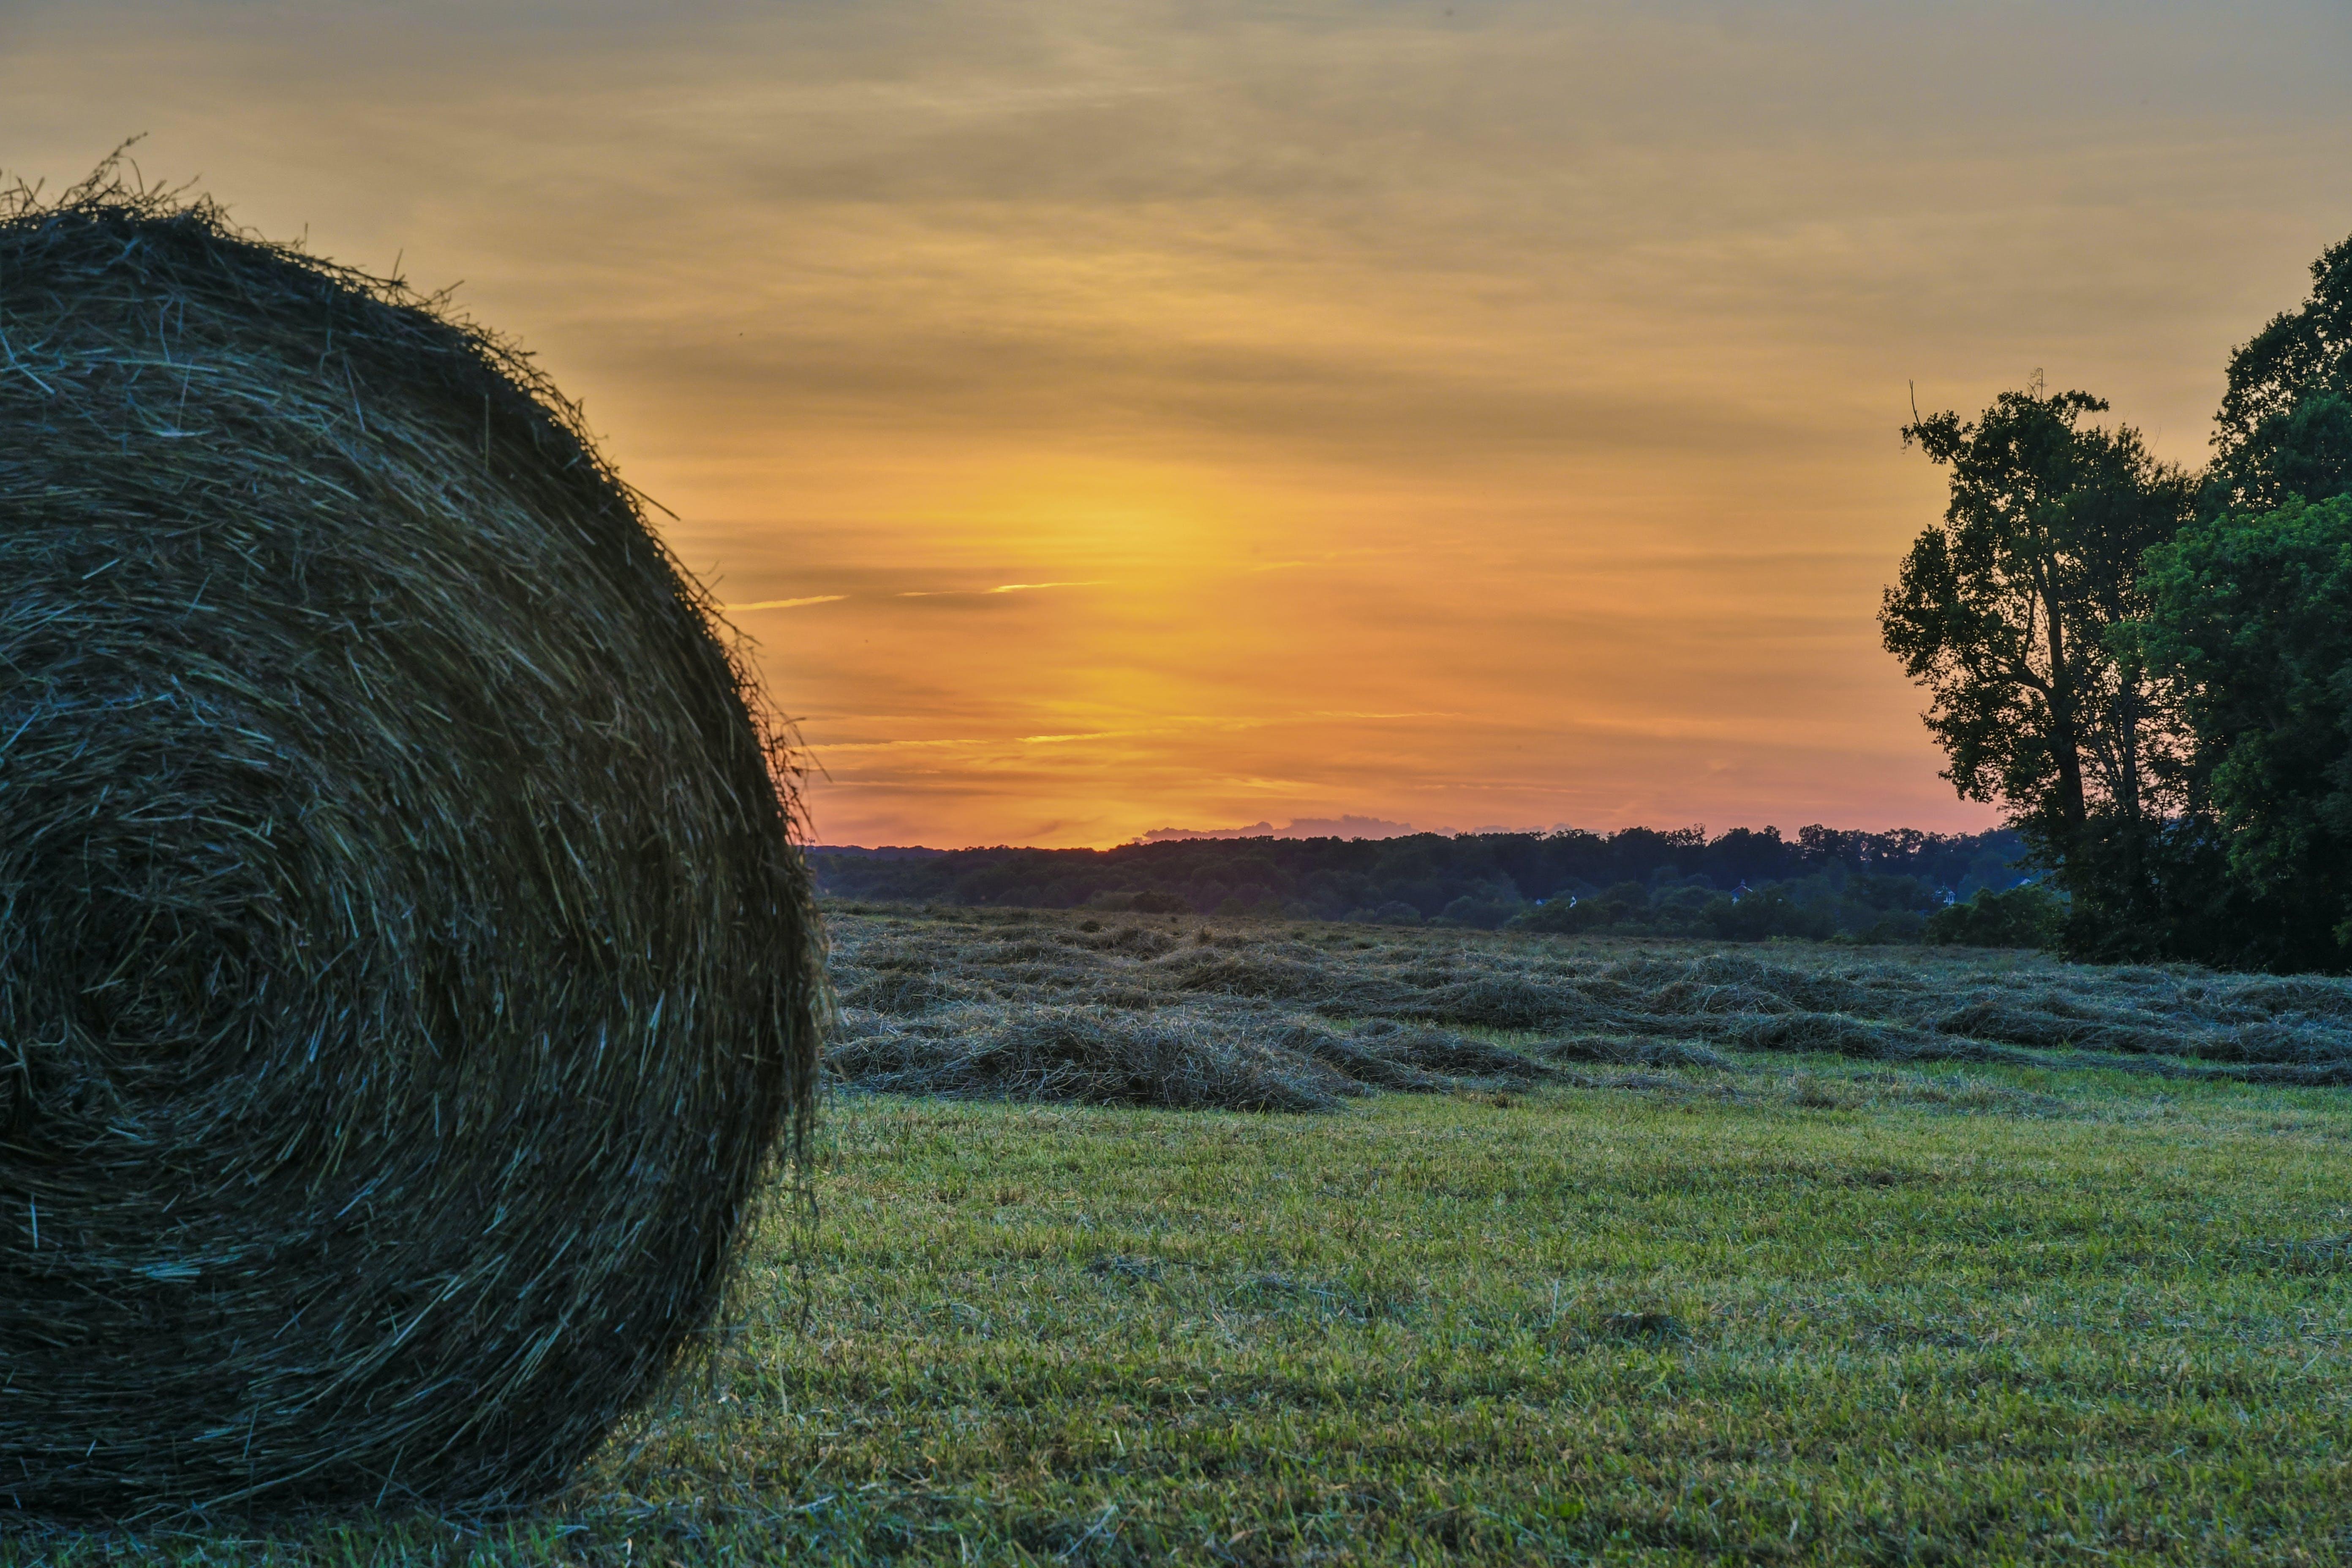 Hayfield During Sunset